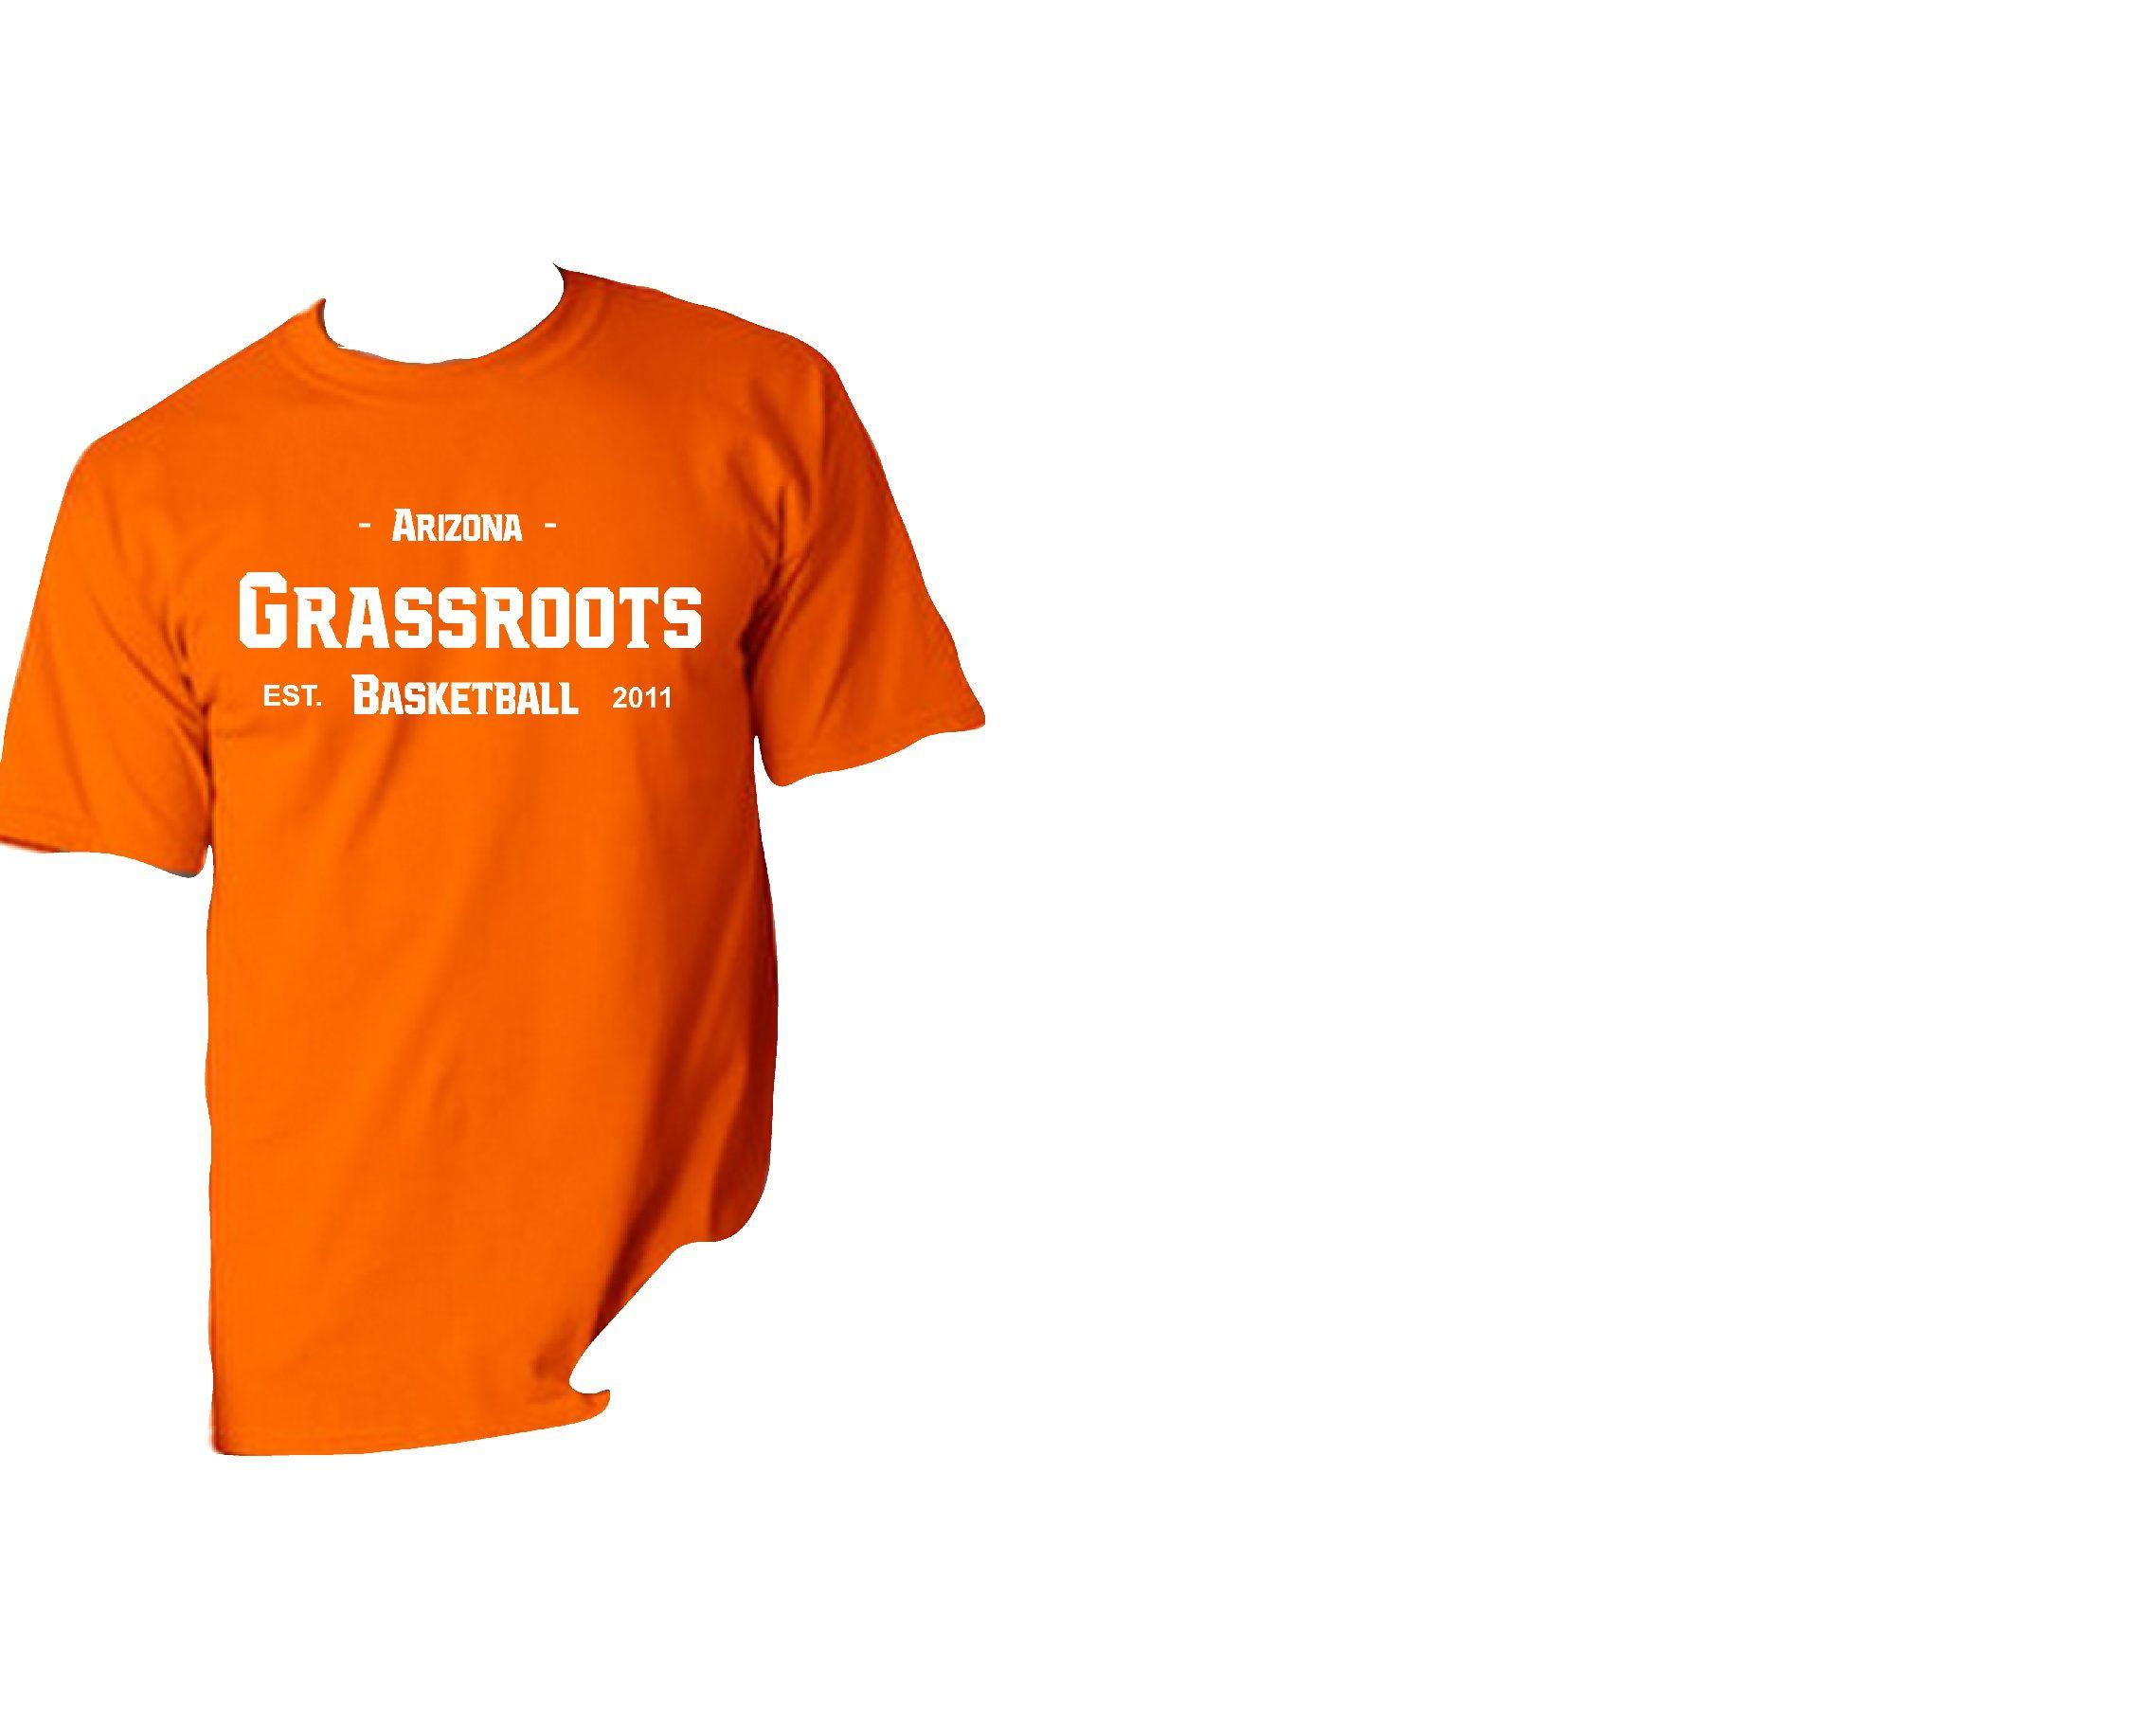 Orange Grassroots 2011 Shirt